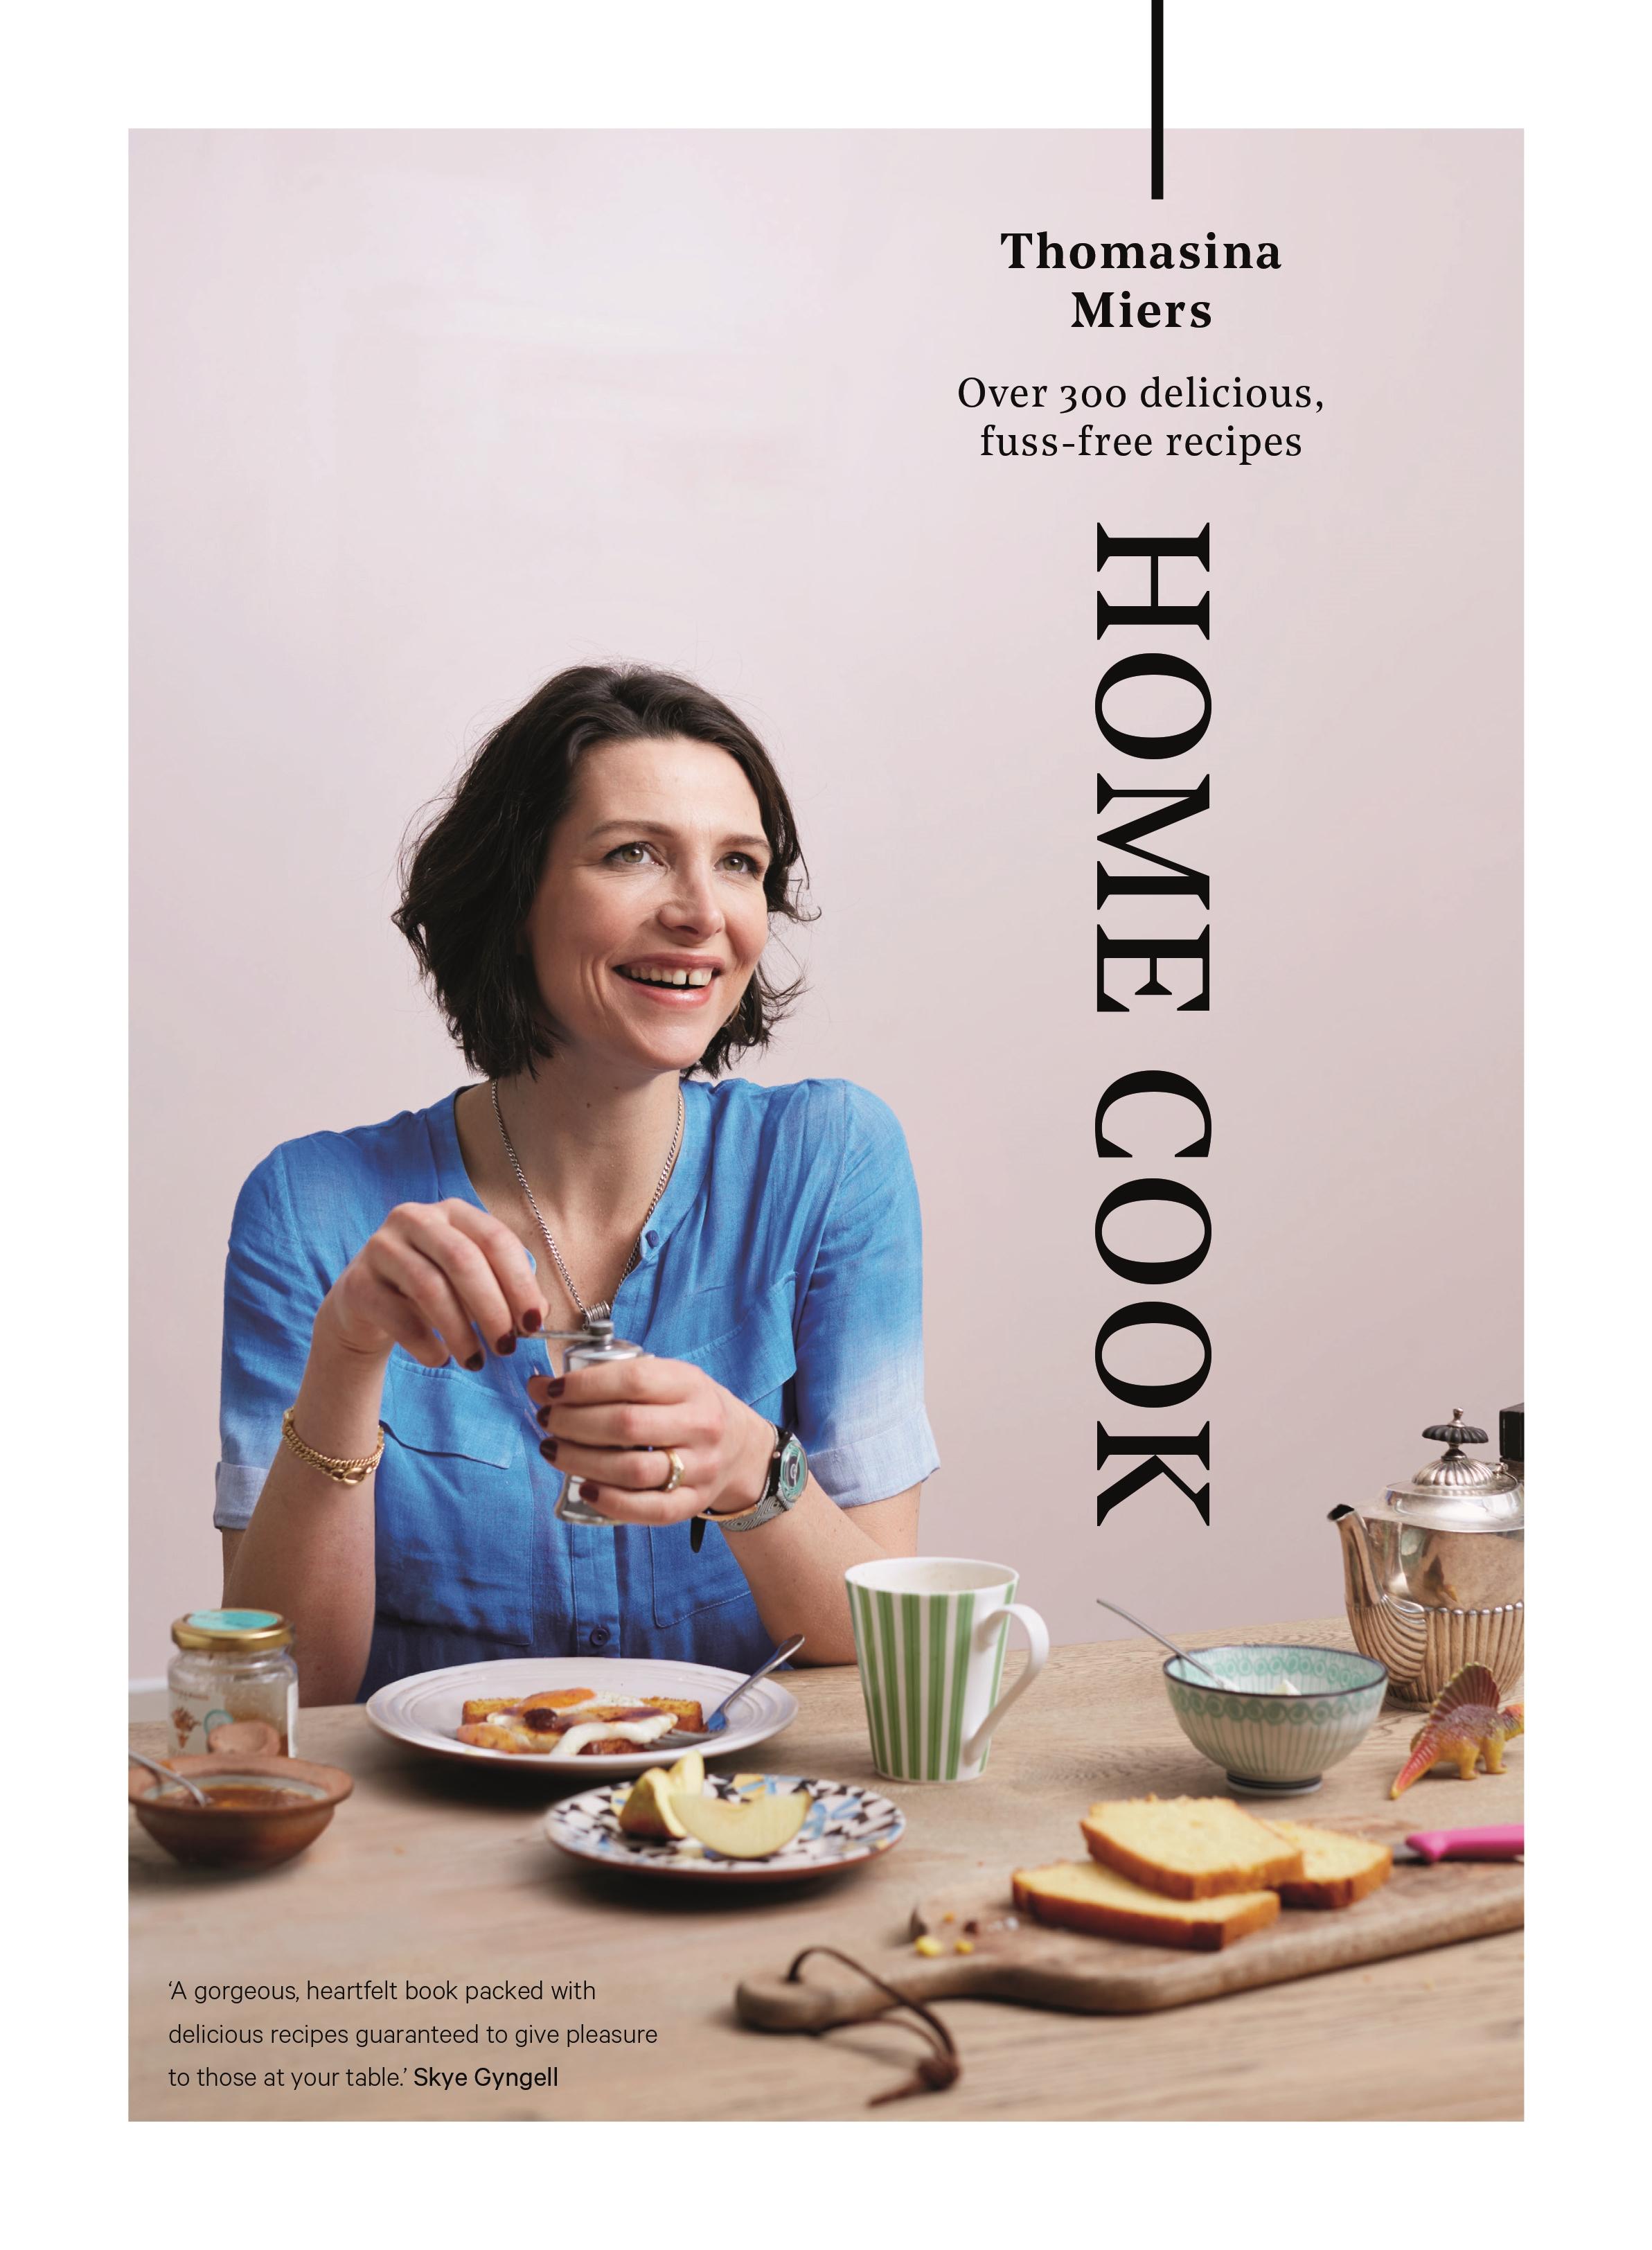 Thomasina Miers Home Cook jacket image.jpg